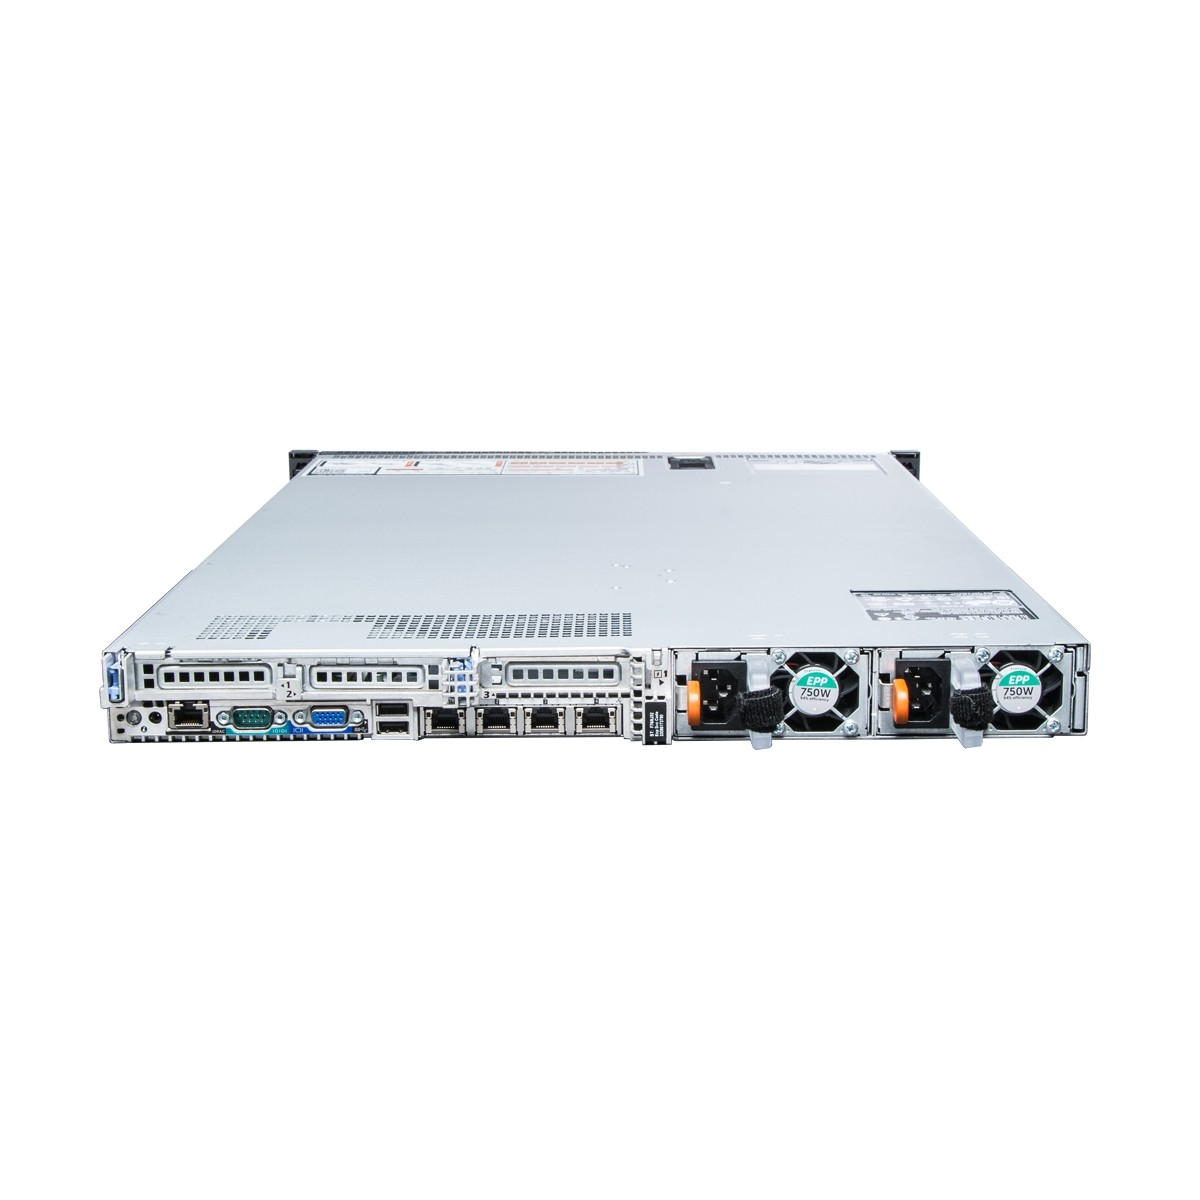 Сервер DELL PowerEdge R630, 2 процессора Intel Xeon 8C E5-2620v4 2.10GHz/20MB, 32GB DRAM, 8SFF, PERC H730/1GB FBWC